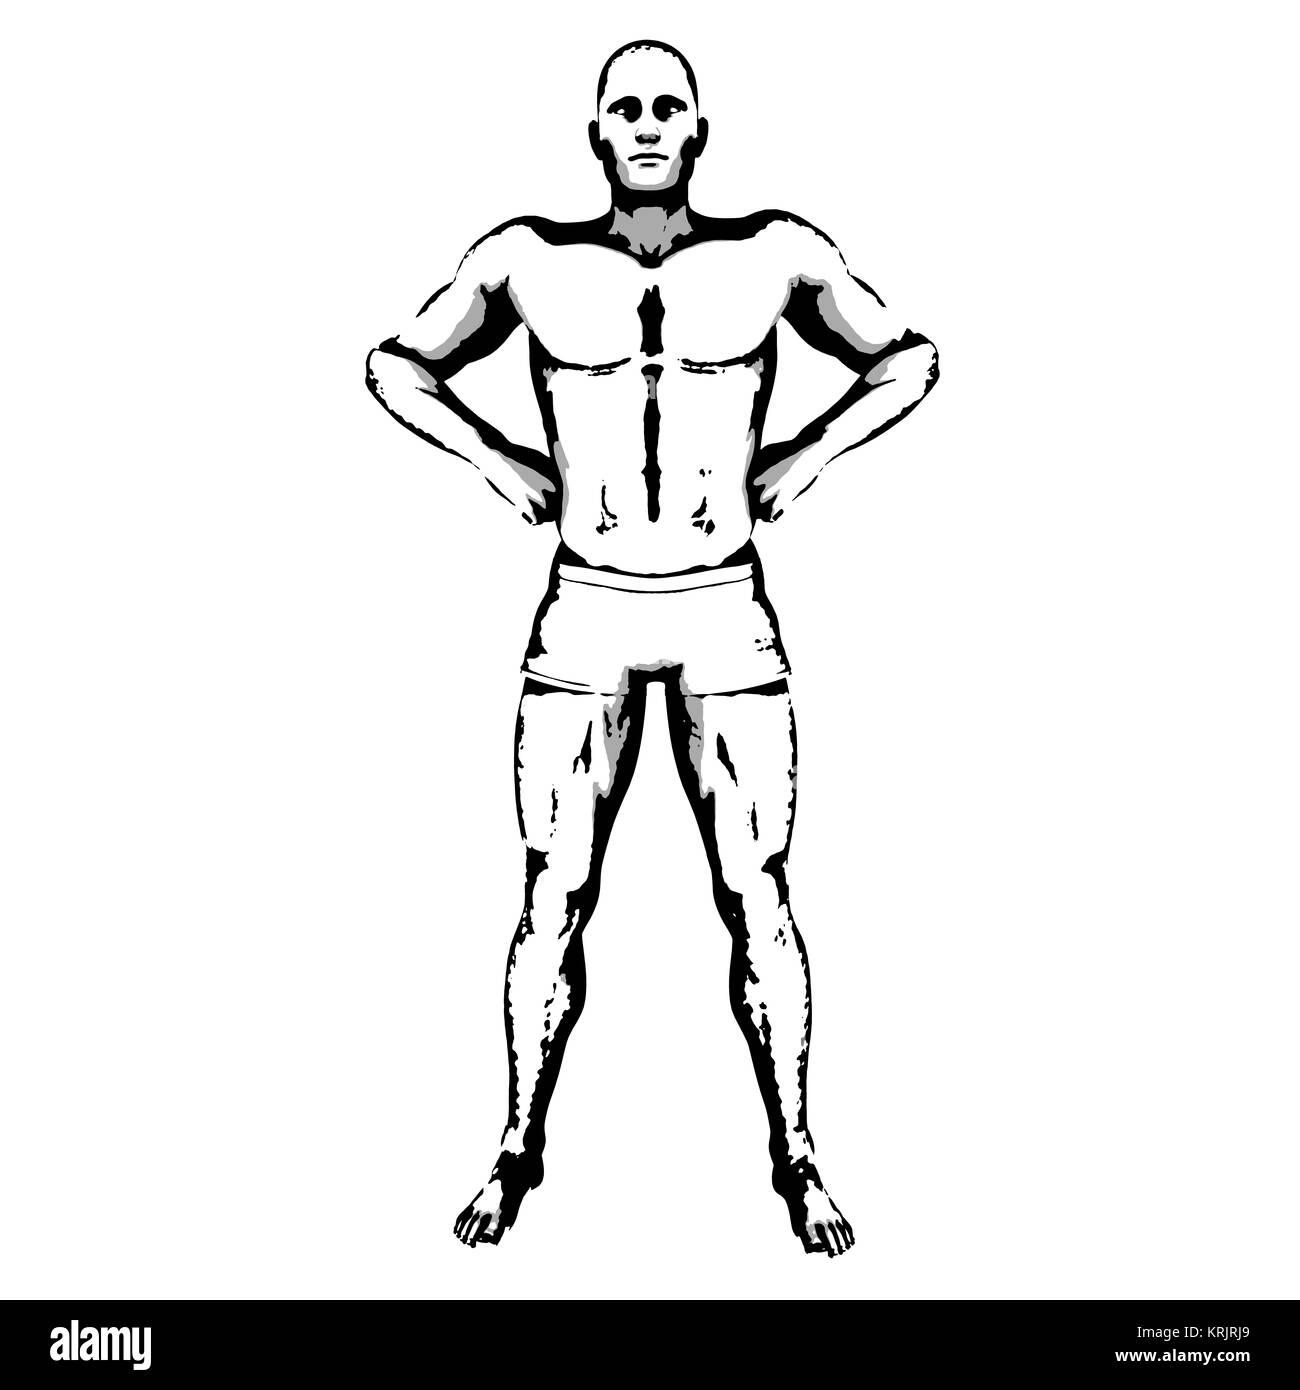 Comic Book Hero Pose - Stock Image